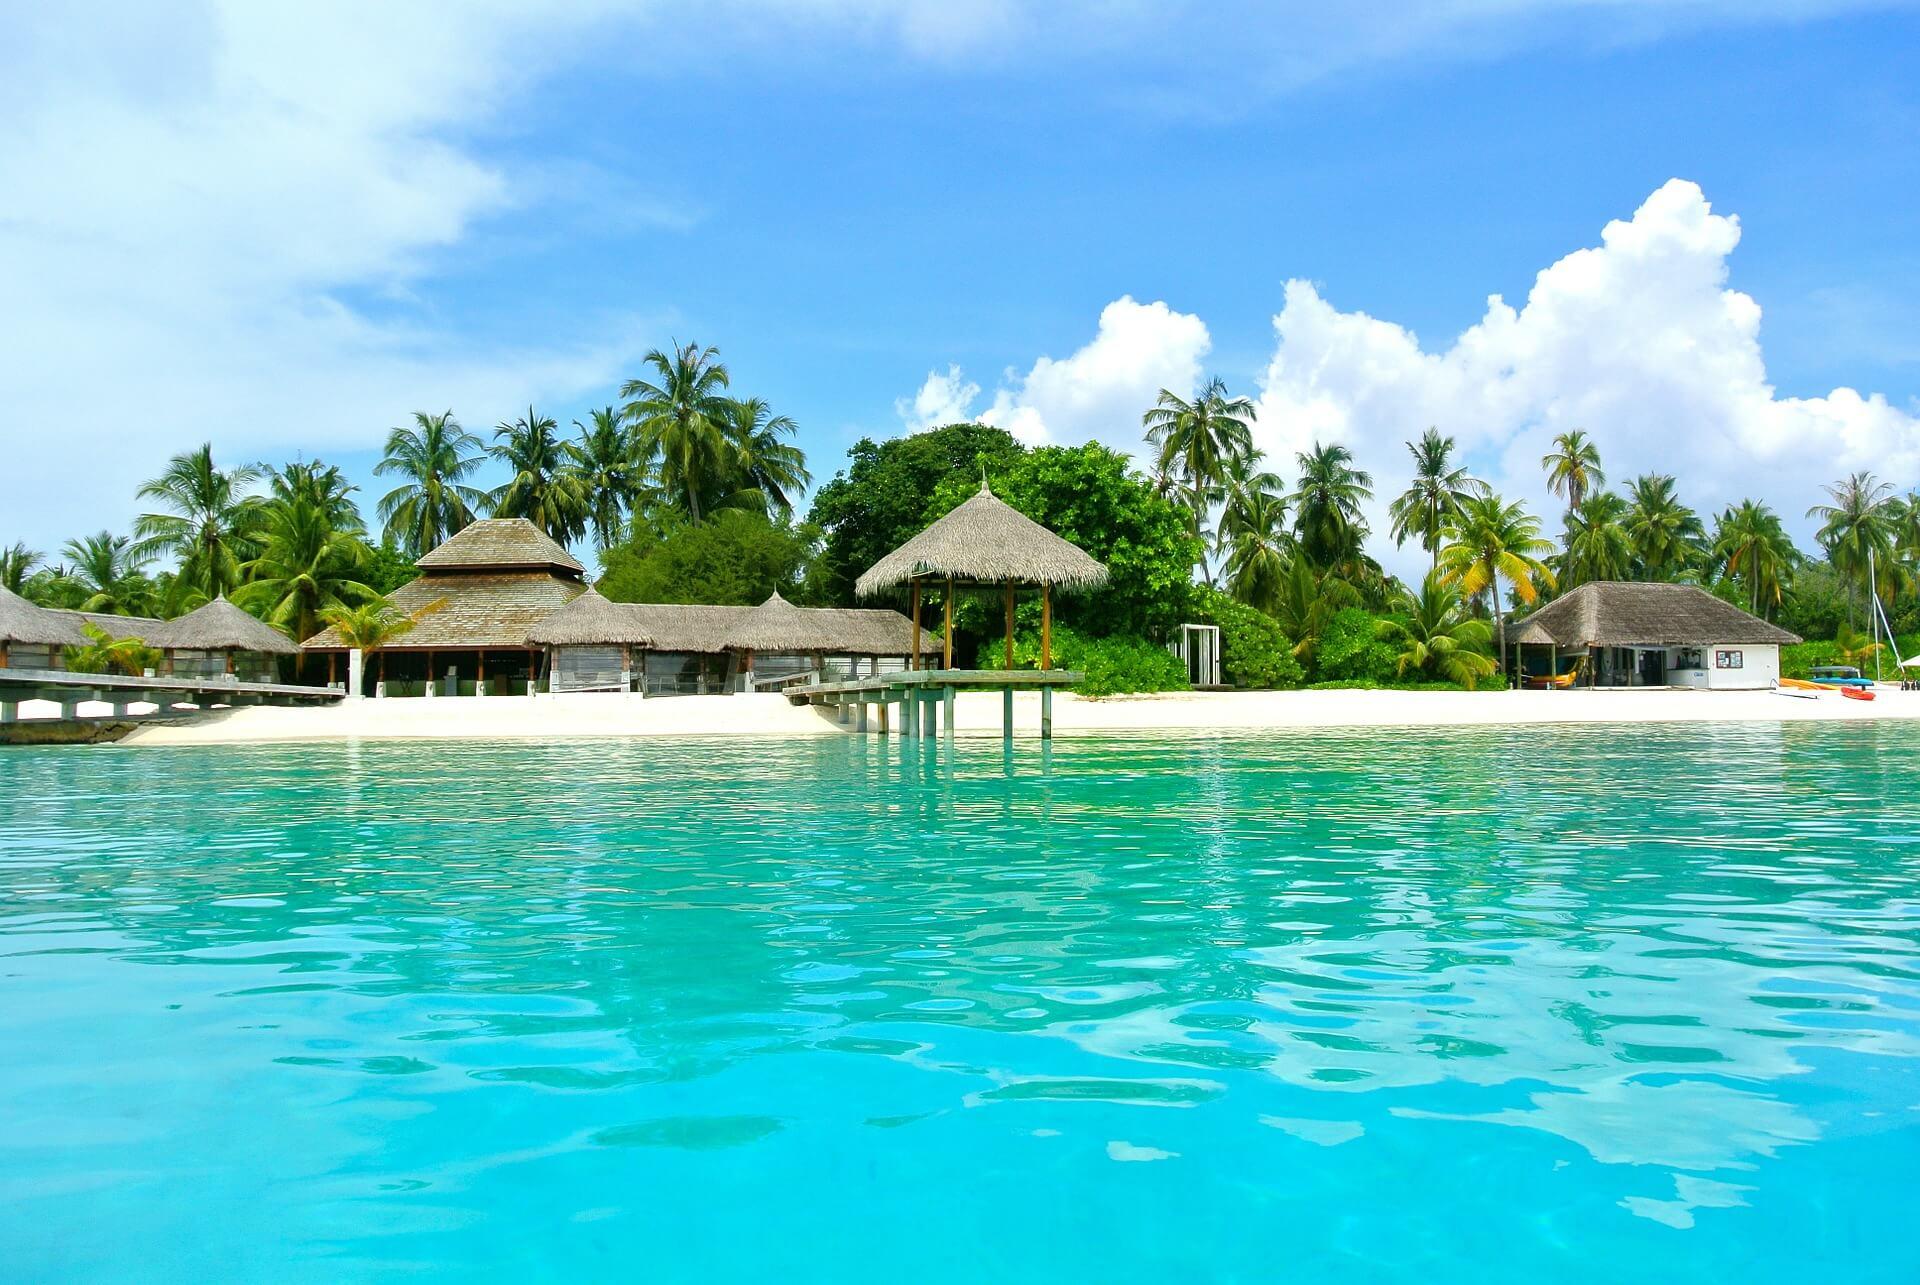 maldives-262516_1920 (1)